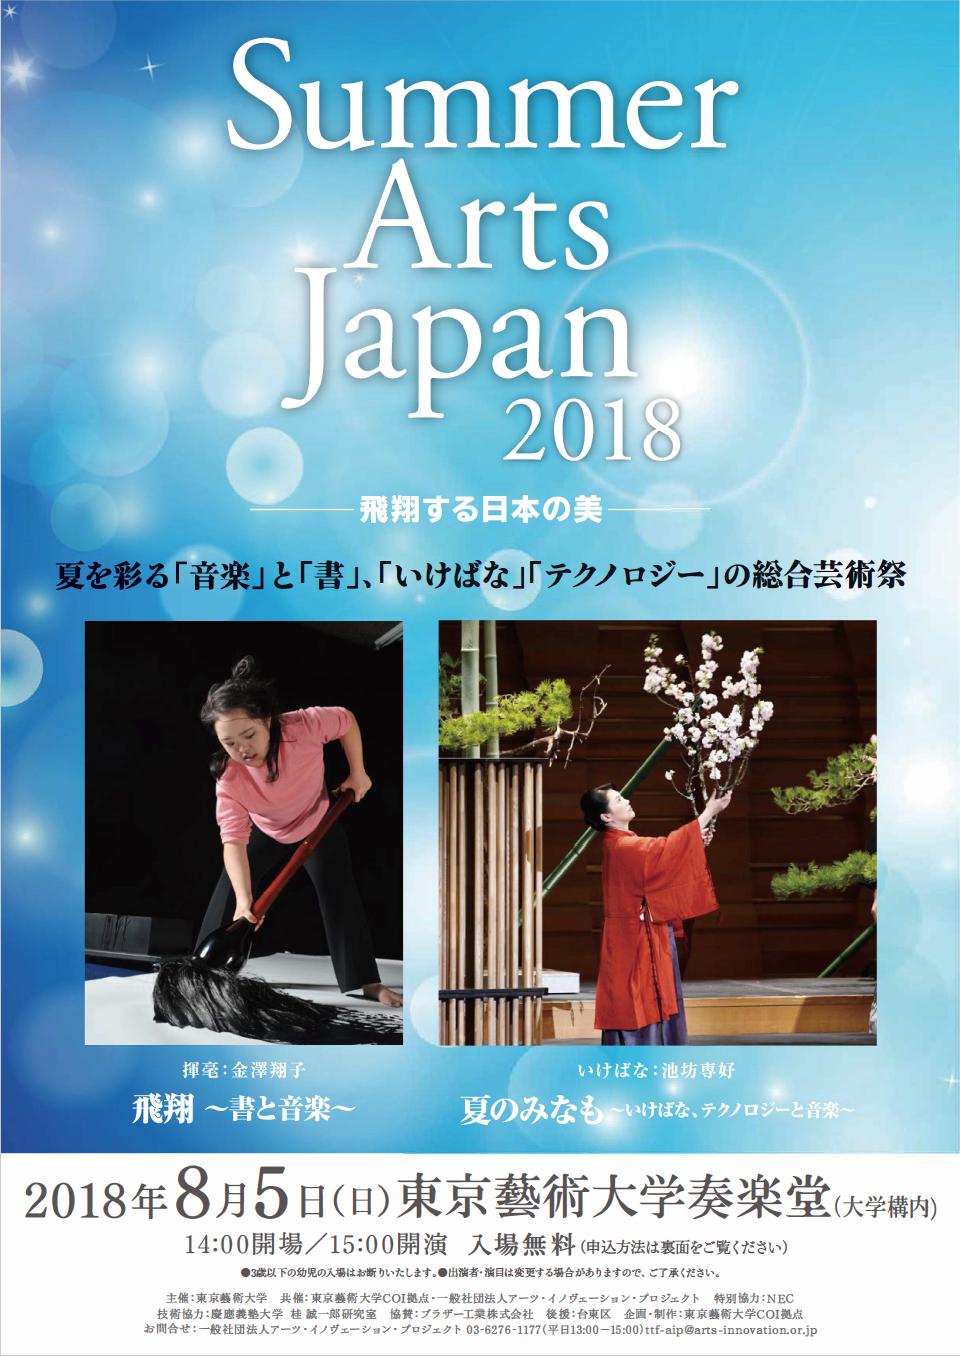 Summer Arts Japan 2018 ―飛翔する日本の美―